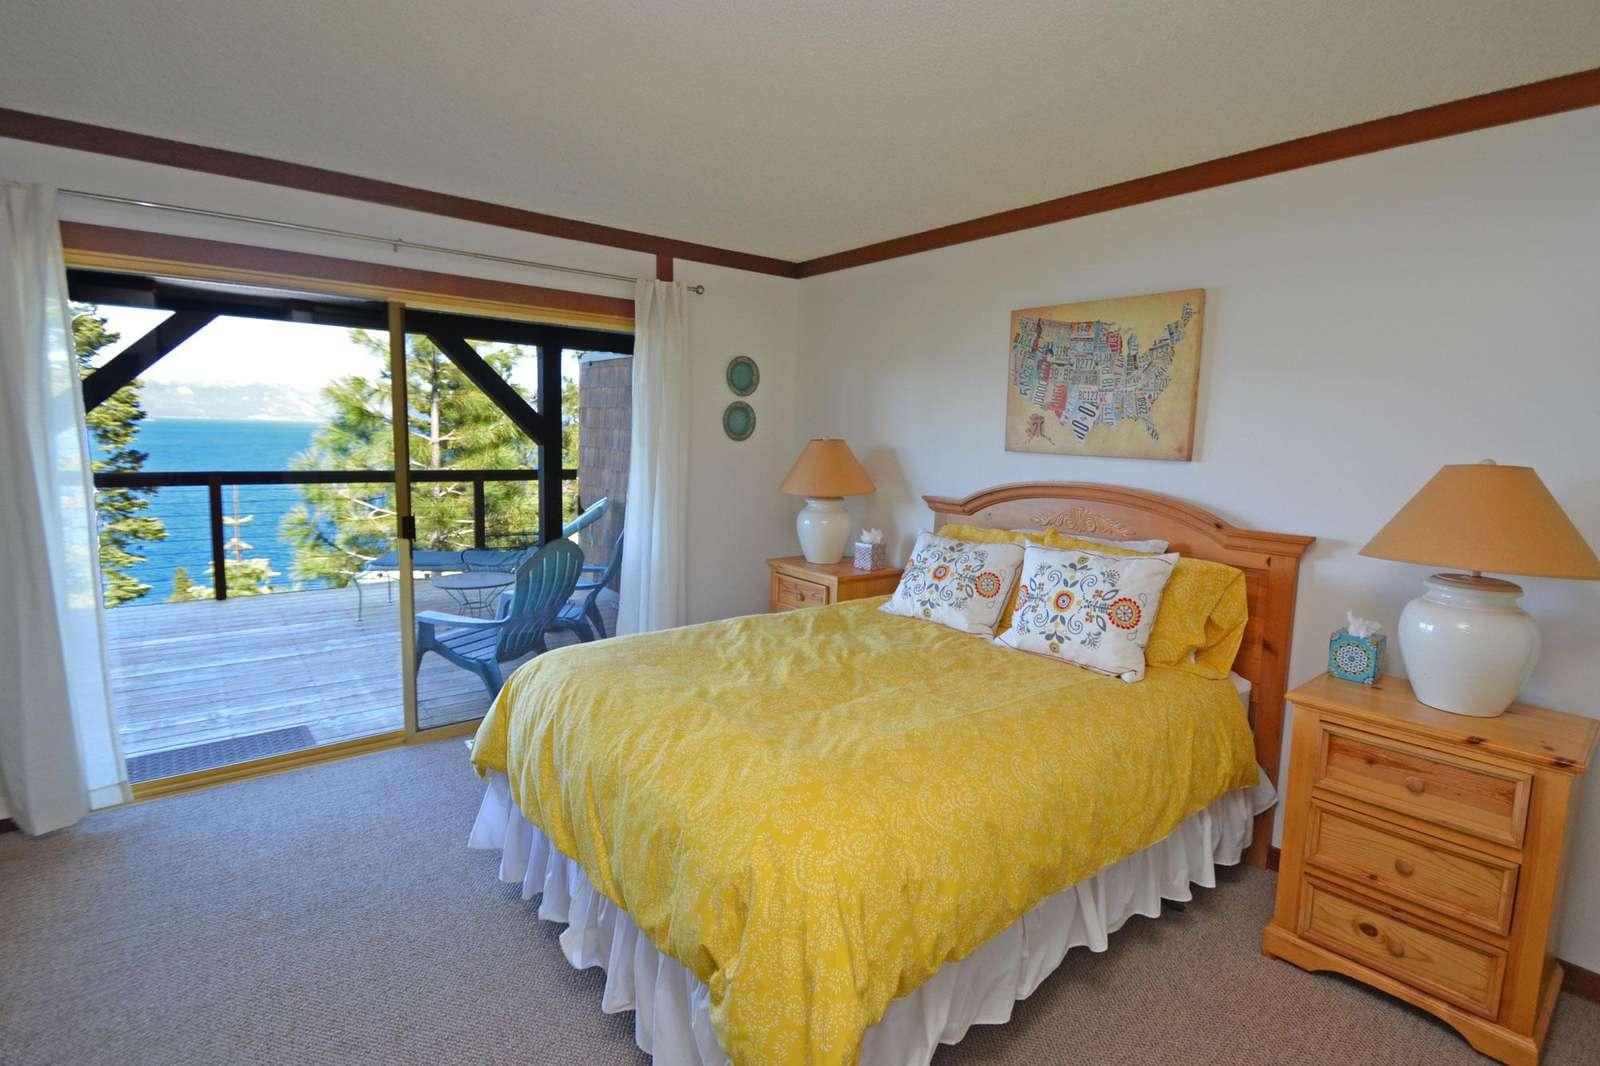 Master Bedroom with Views of Lake Tahoe